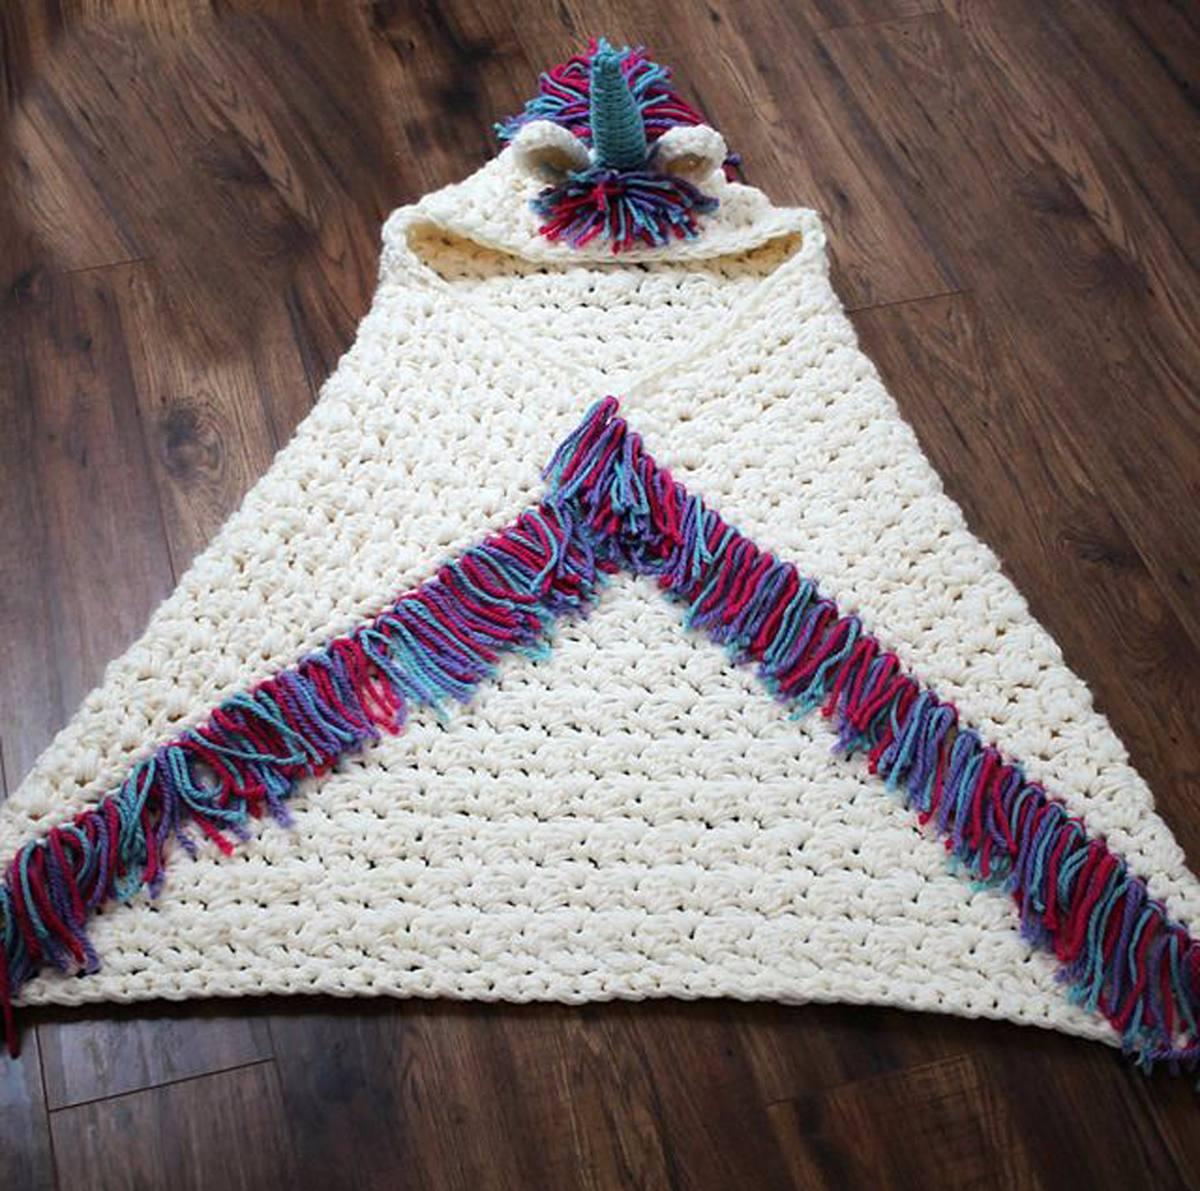 Manta Con Capucha Unicornio - Adultos / Niños - Crochet - $ 2.500,00 ...